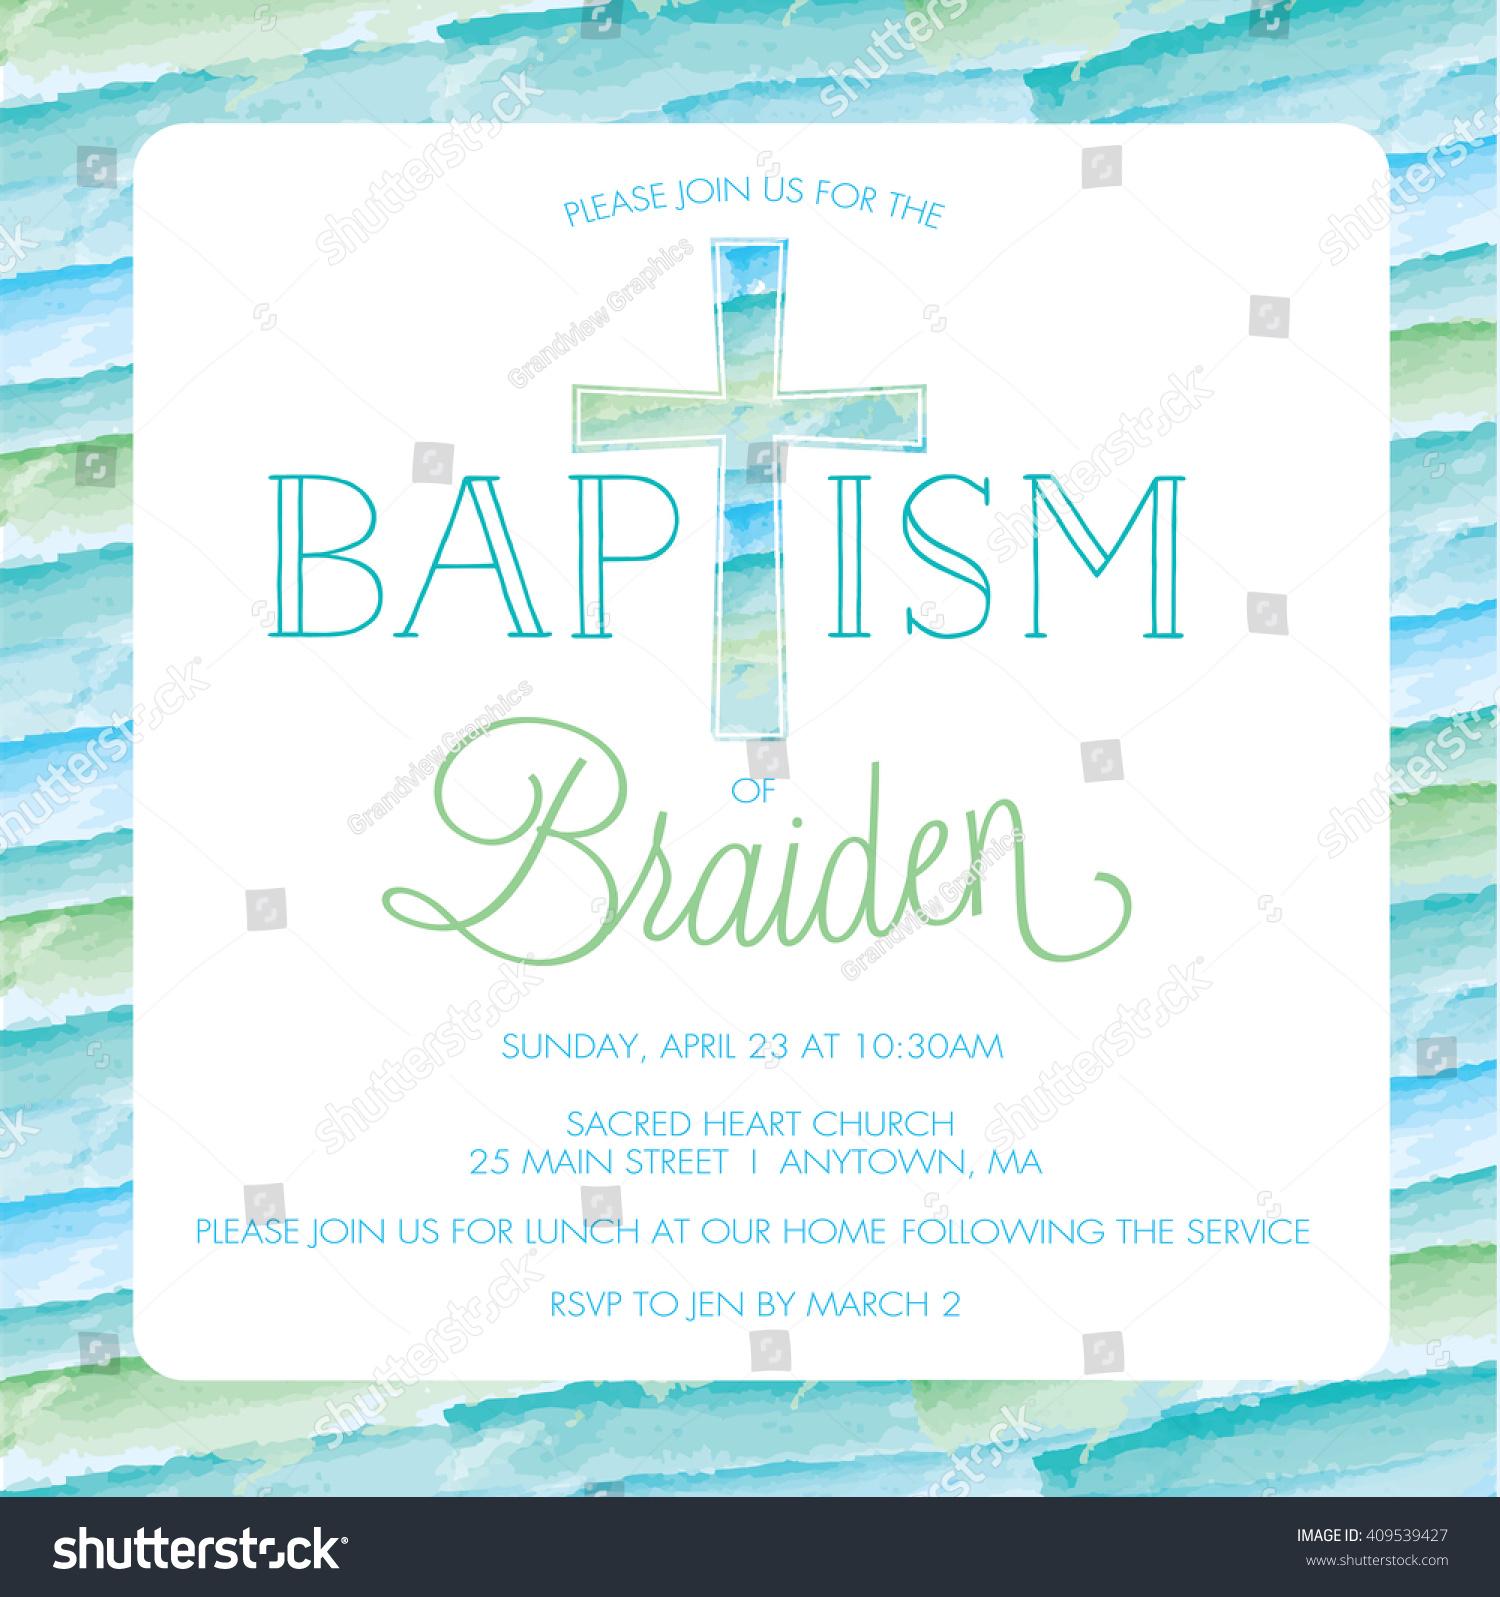 baptism christening invitation card invite template のベクター画像